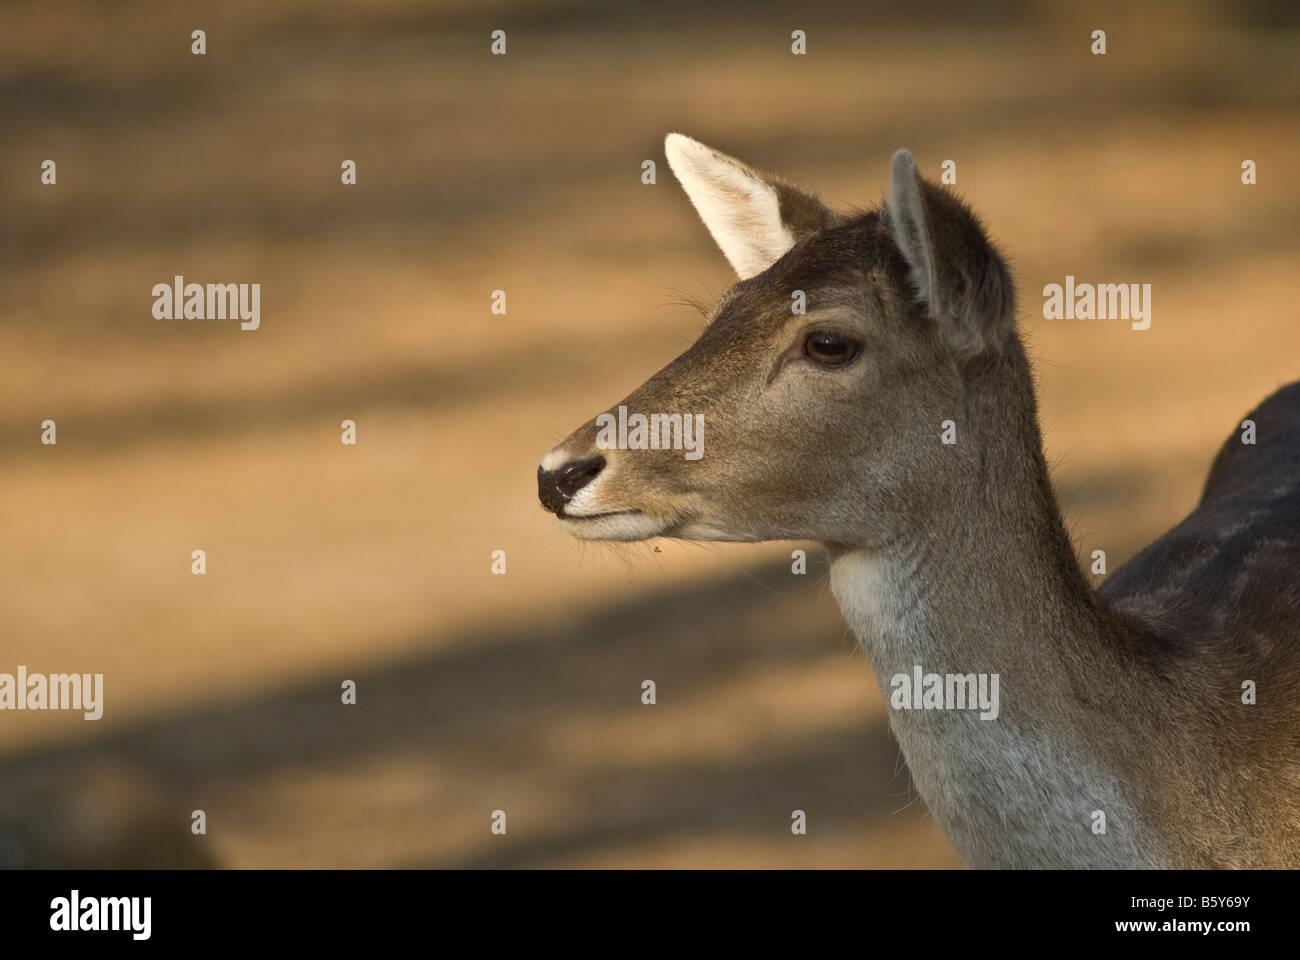 Female llama, Lama glama, Camelidae family mammal - Stock Image